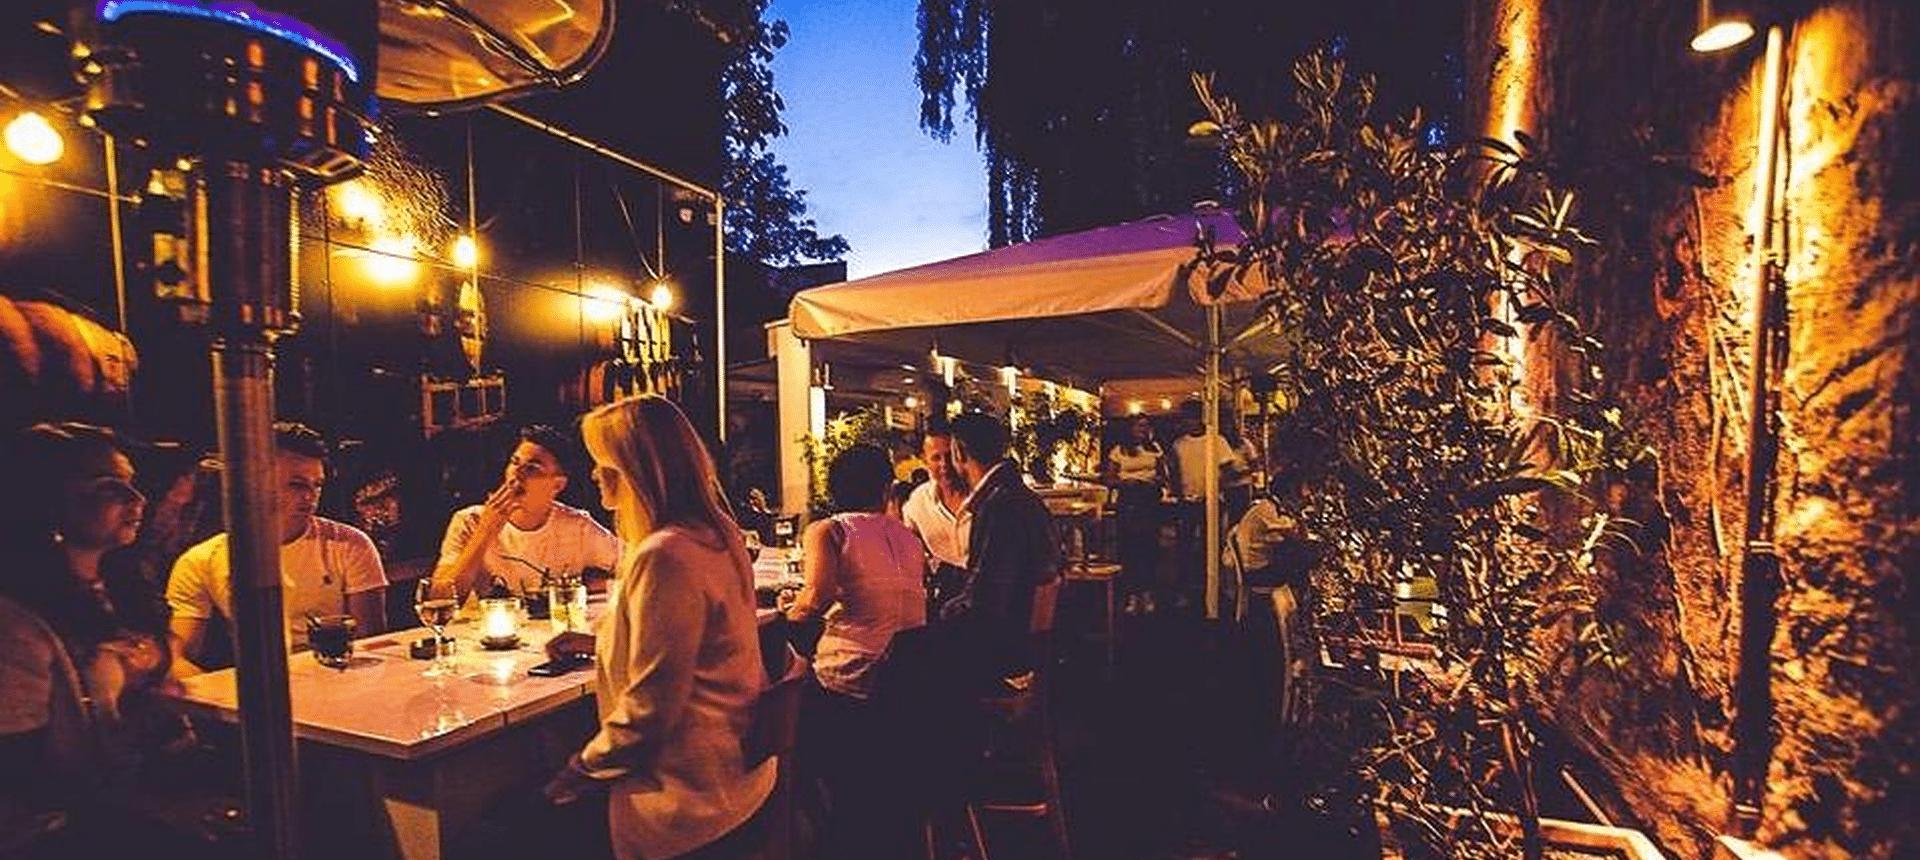 Brut food en wine bar - Dordrecht - restaurant - bar - terras